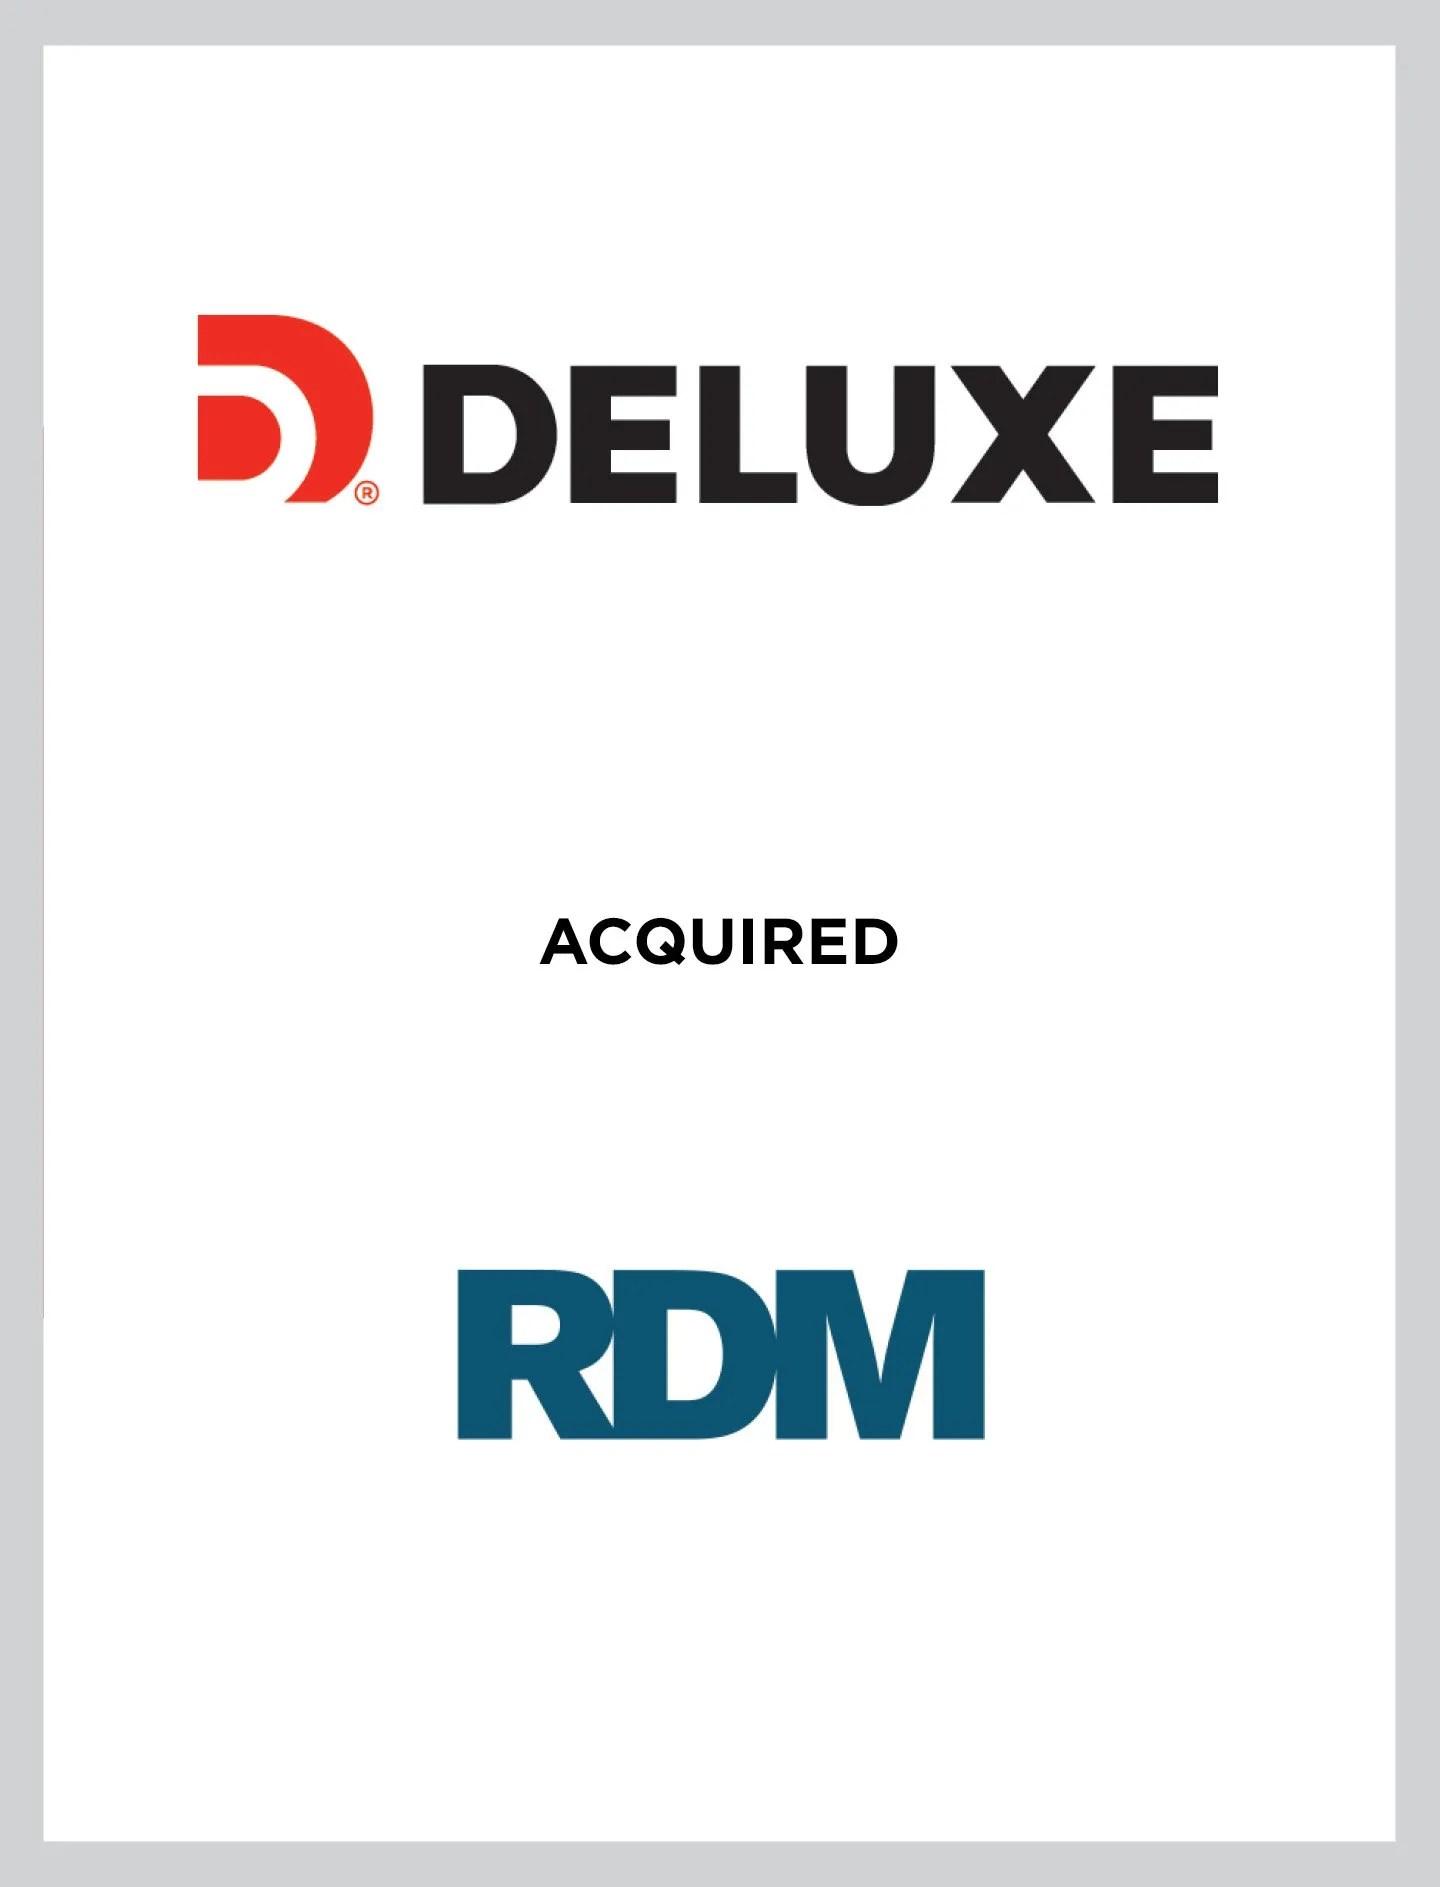 Deluxe/RDM Case Study